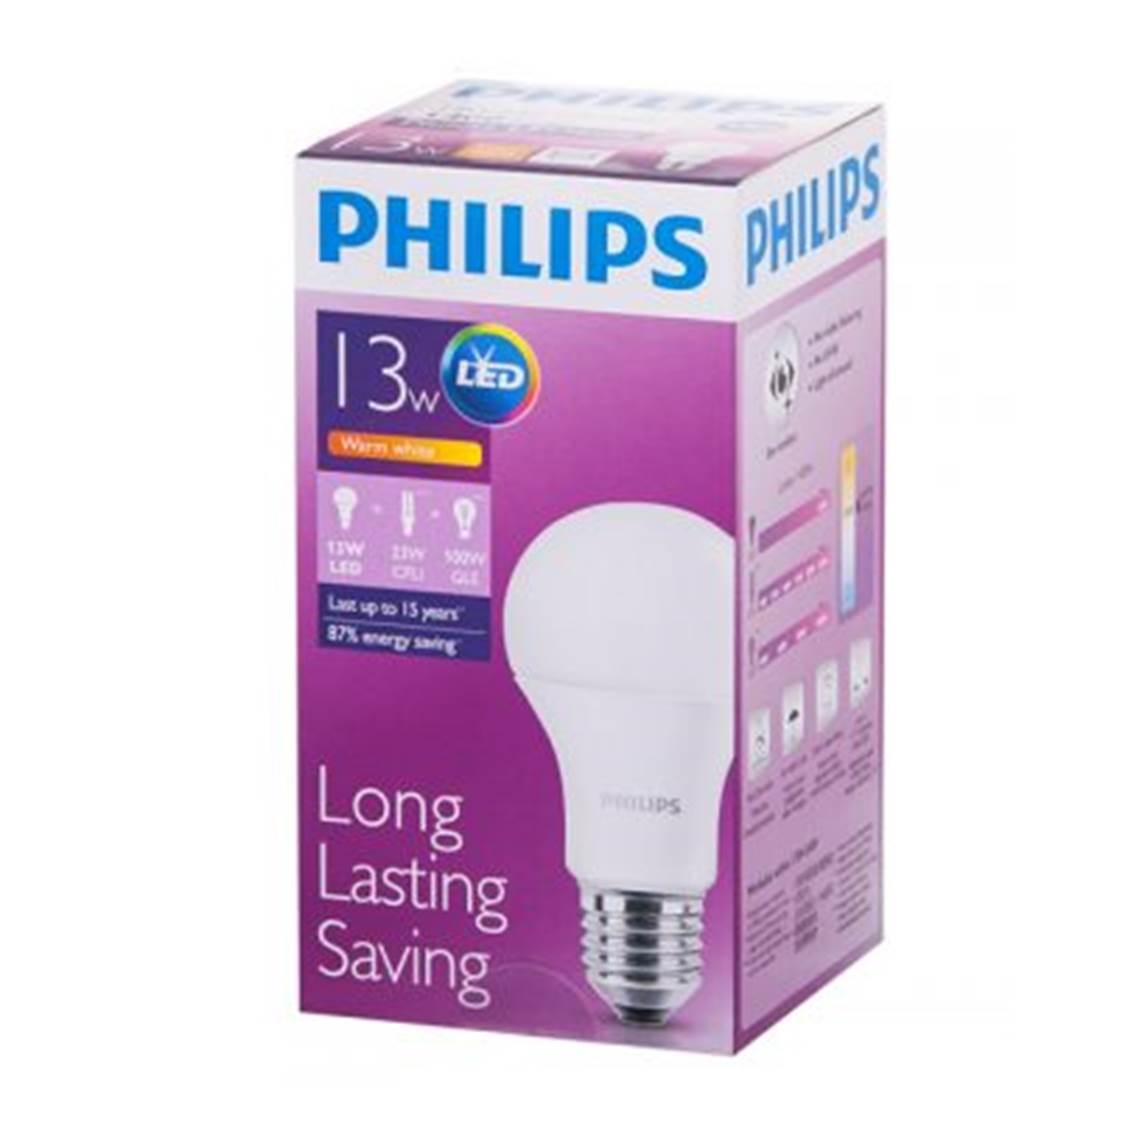 PHILIPS[原箱]LED球膽 13W 釘頭 白光 *6件